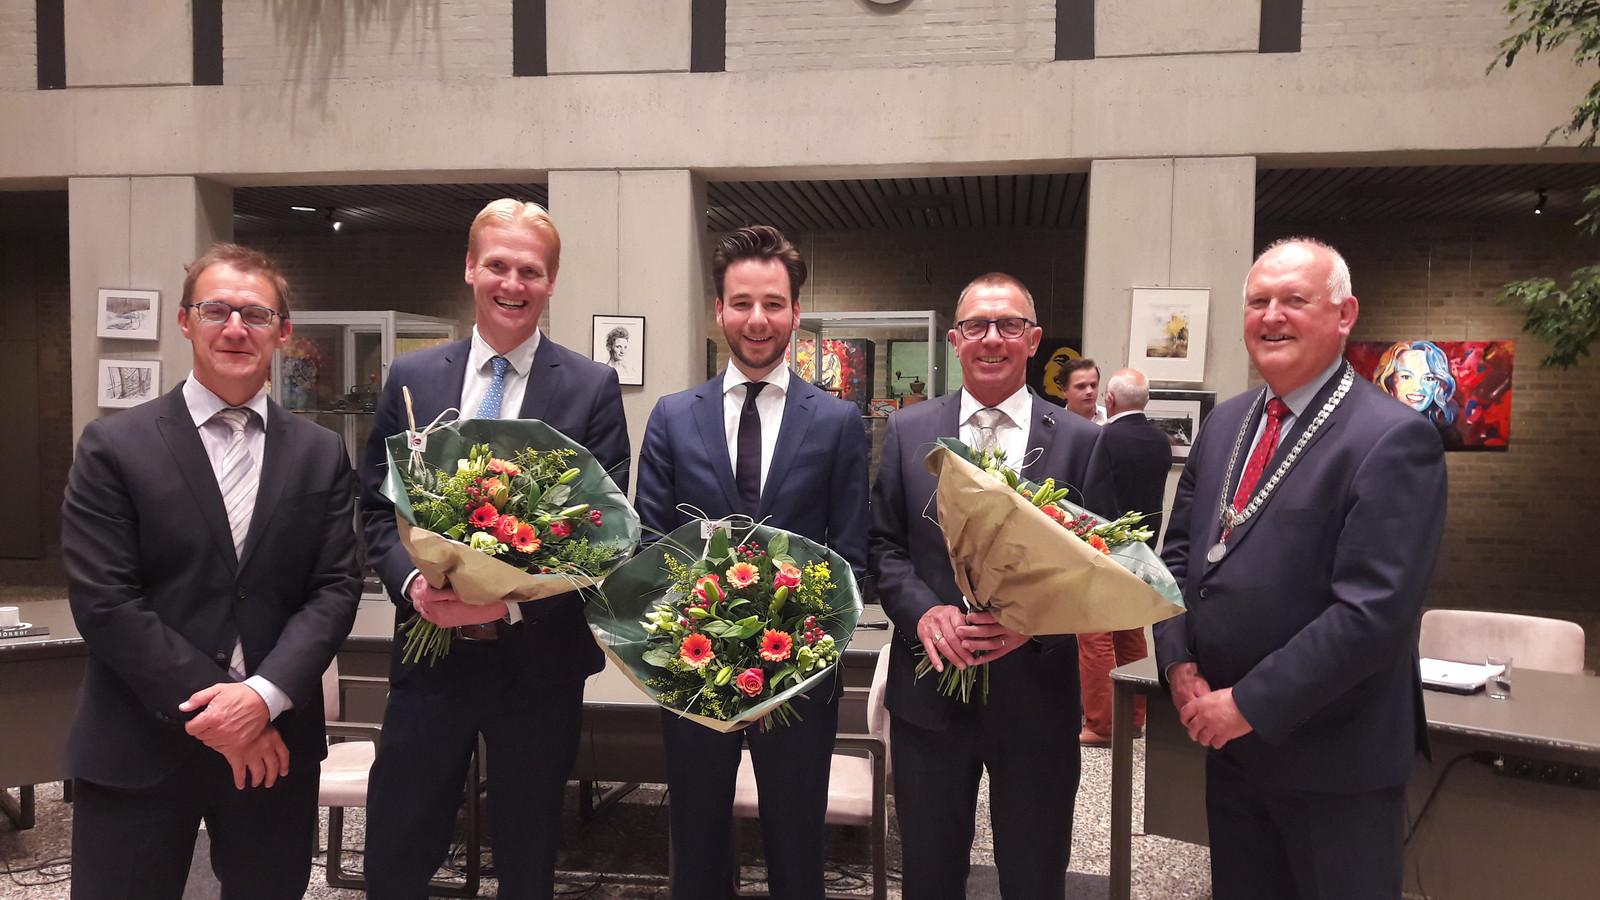 Het nieuwe college van Deurne: v.l.n.r gemeentesecretaris Robbert Halffman, de wethouders Marnix Schlosser, Marinus Biemans en Helm Verhees en burgemeester Hilko Mak.